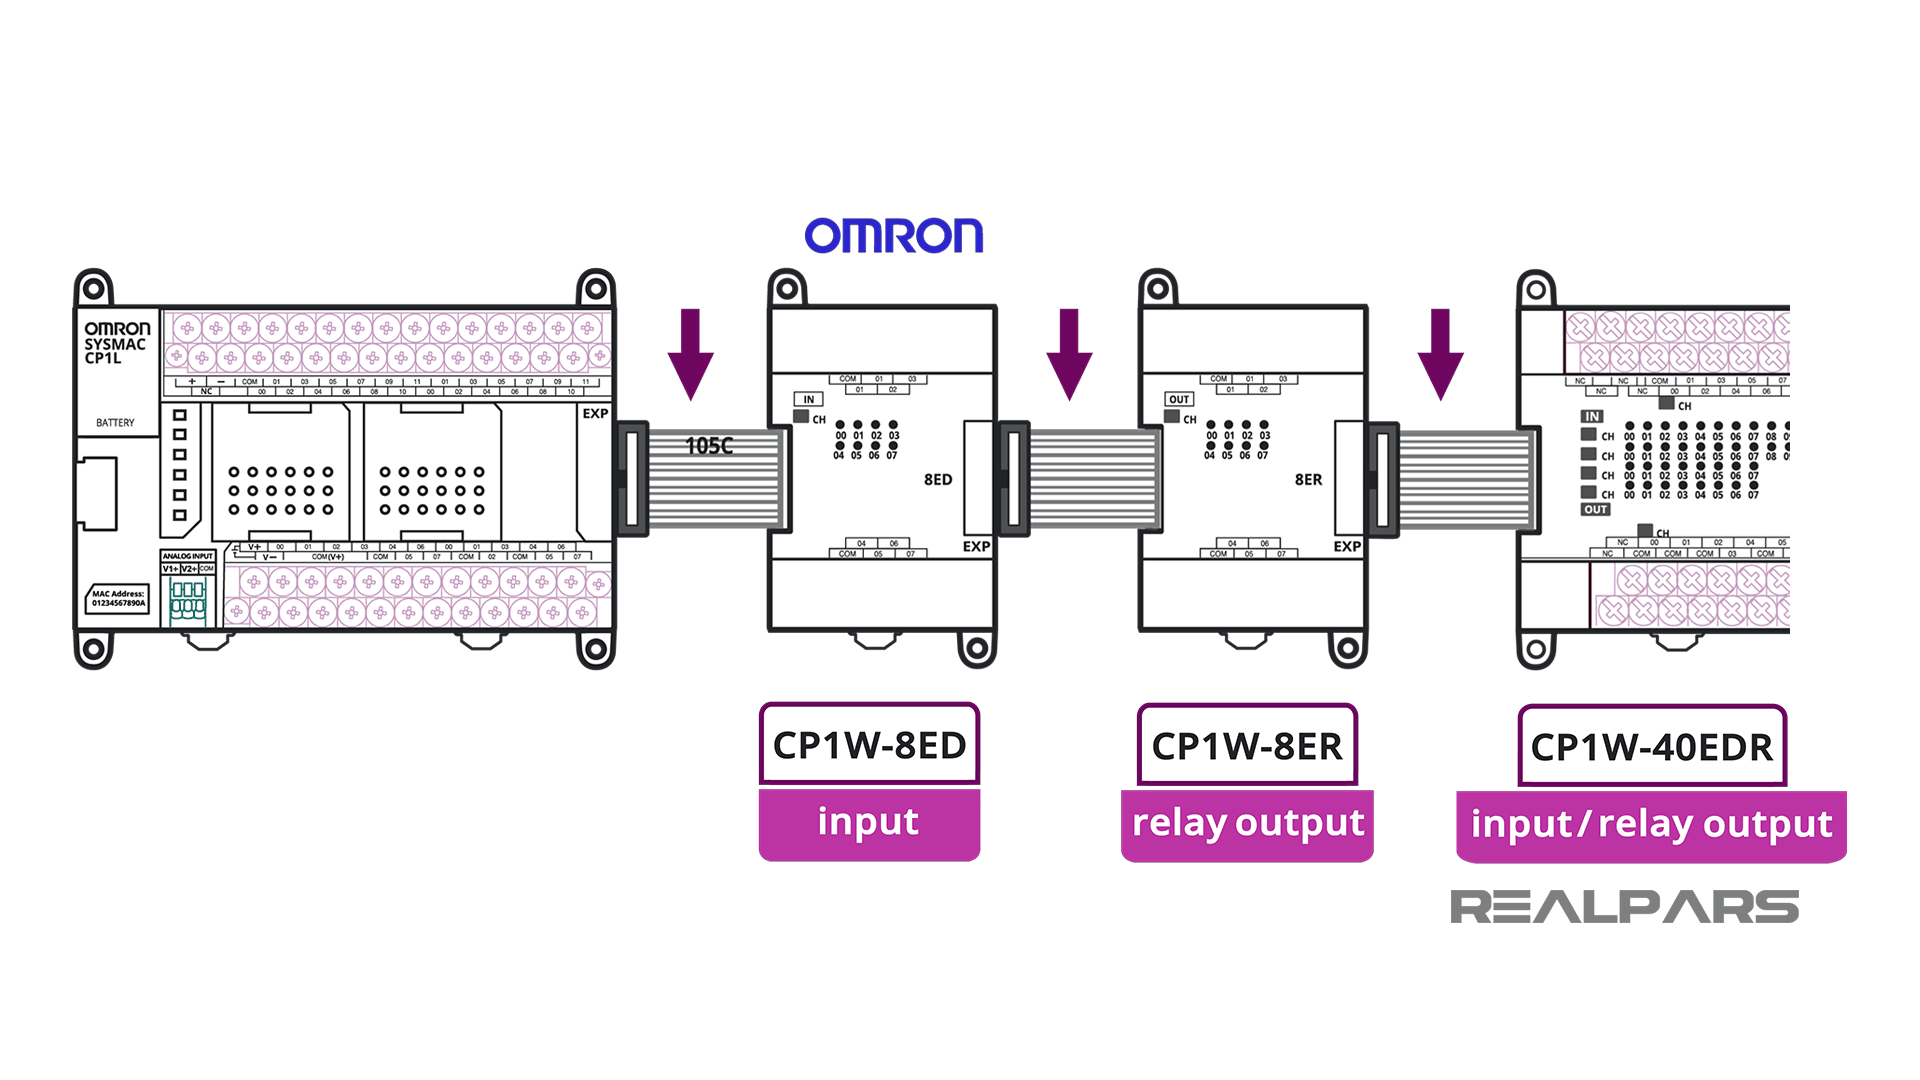 Example System Hardware Configuration